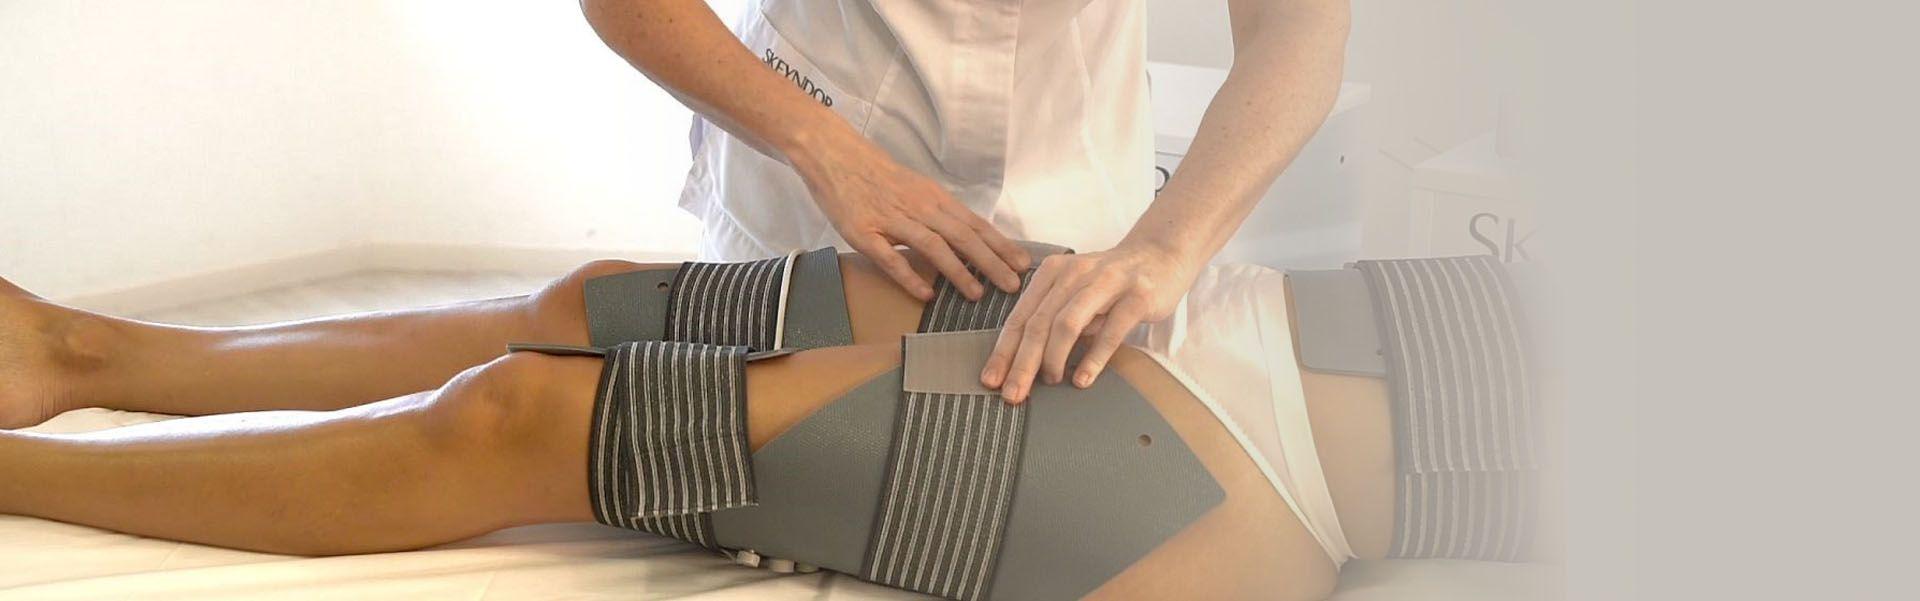 Fototerapia dinámica corporal en Valencia. Sentir & Ser Centro de Estética Avanzado en Valencia